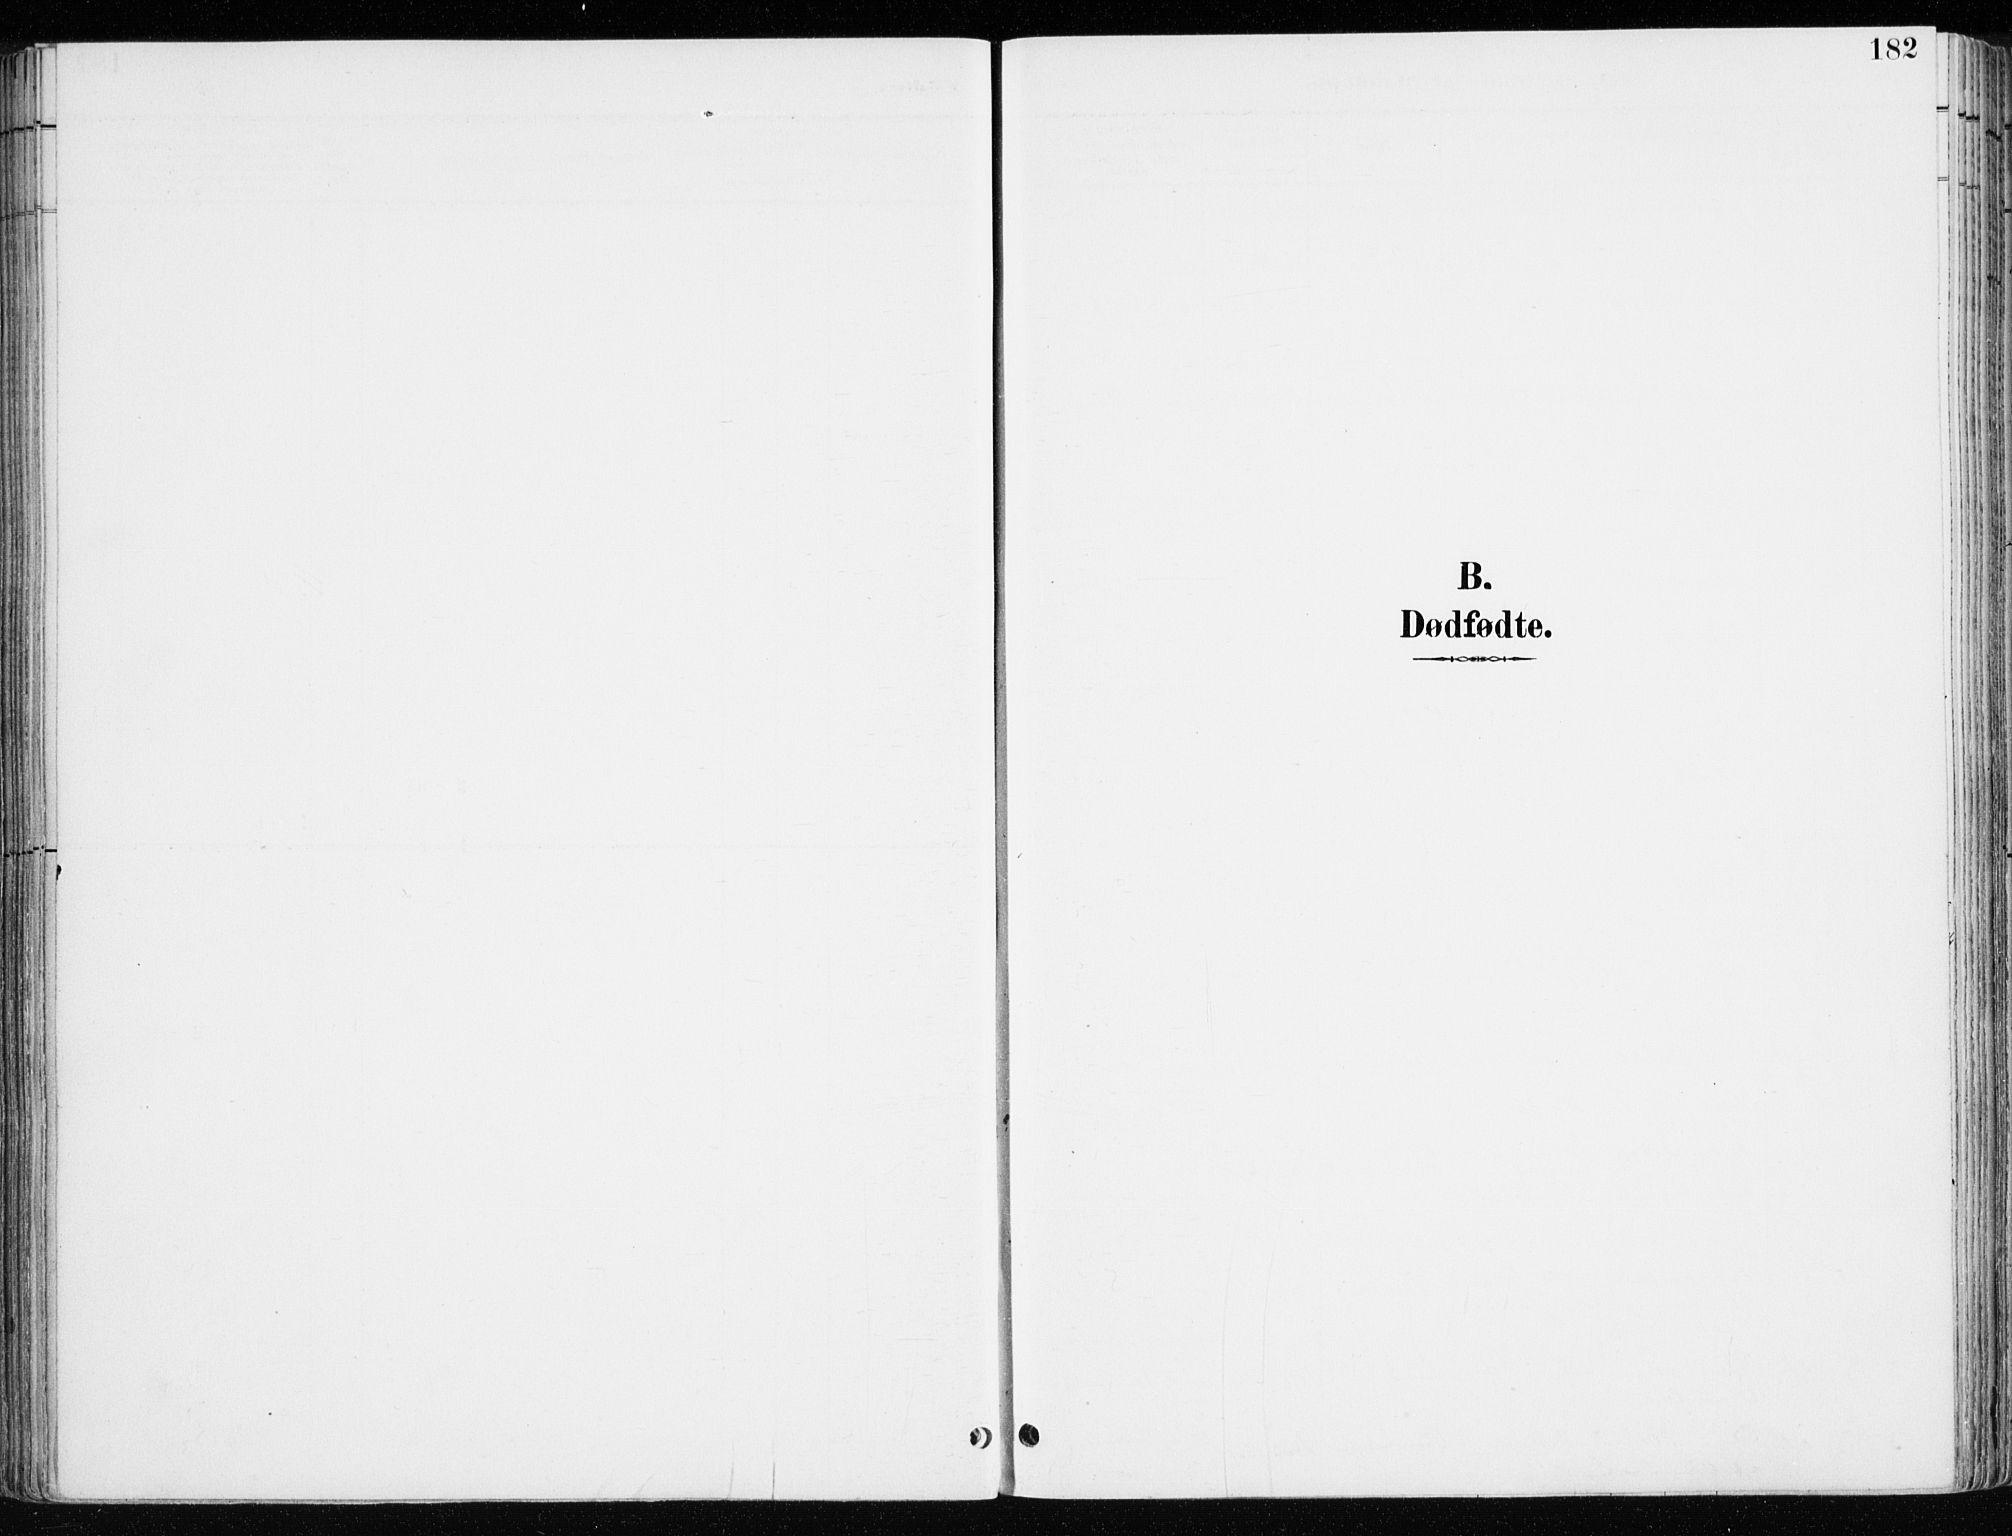 SAH, Løten prestekontor, K/Ka/L0010: Ministerialbok nr. 10, 1892-1907, s. 182